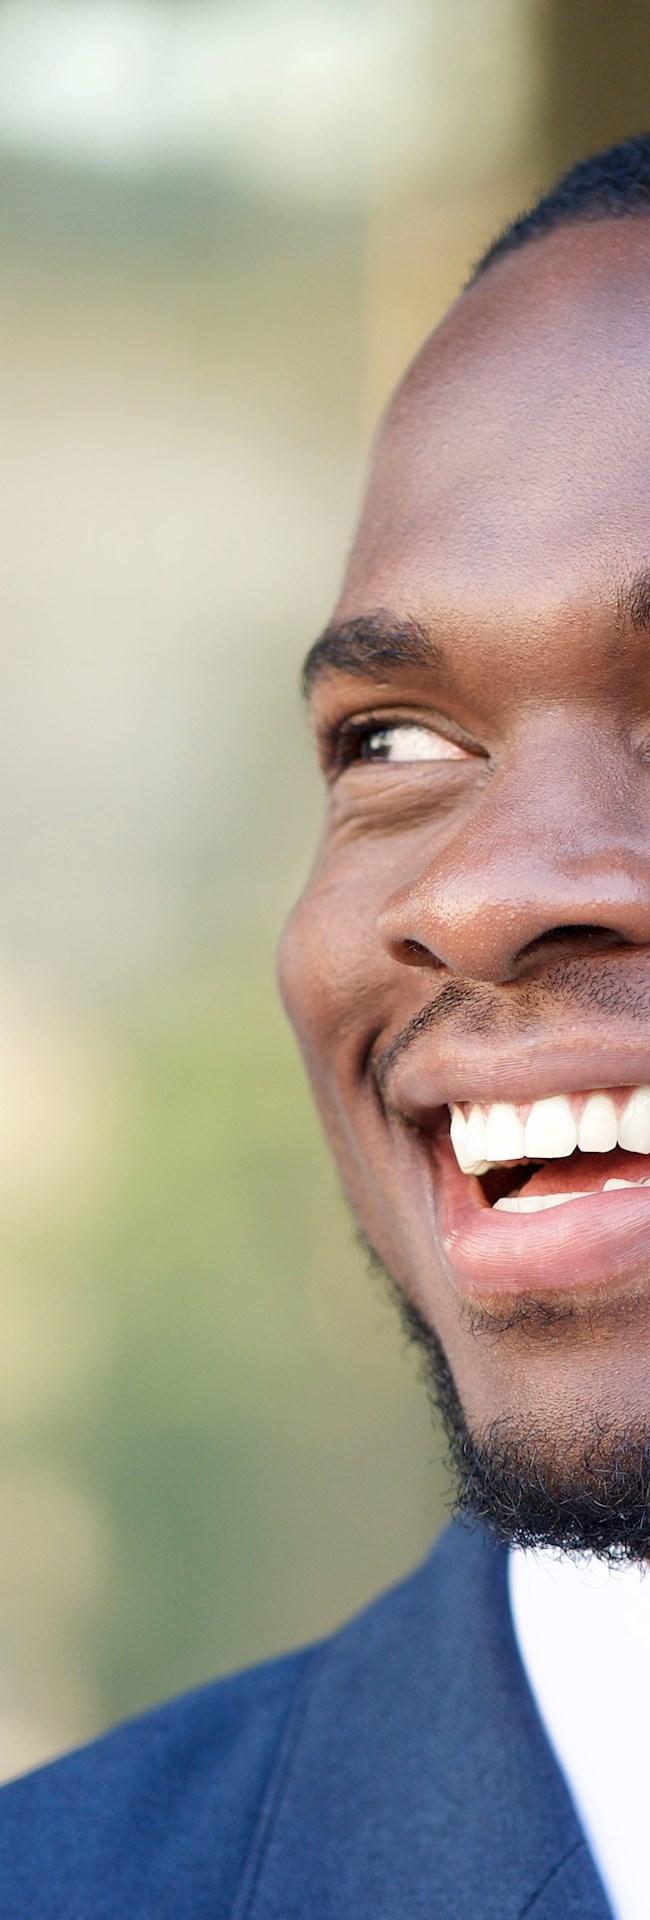 Brazilian candidate smiling after landing job